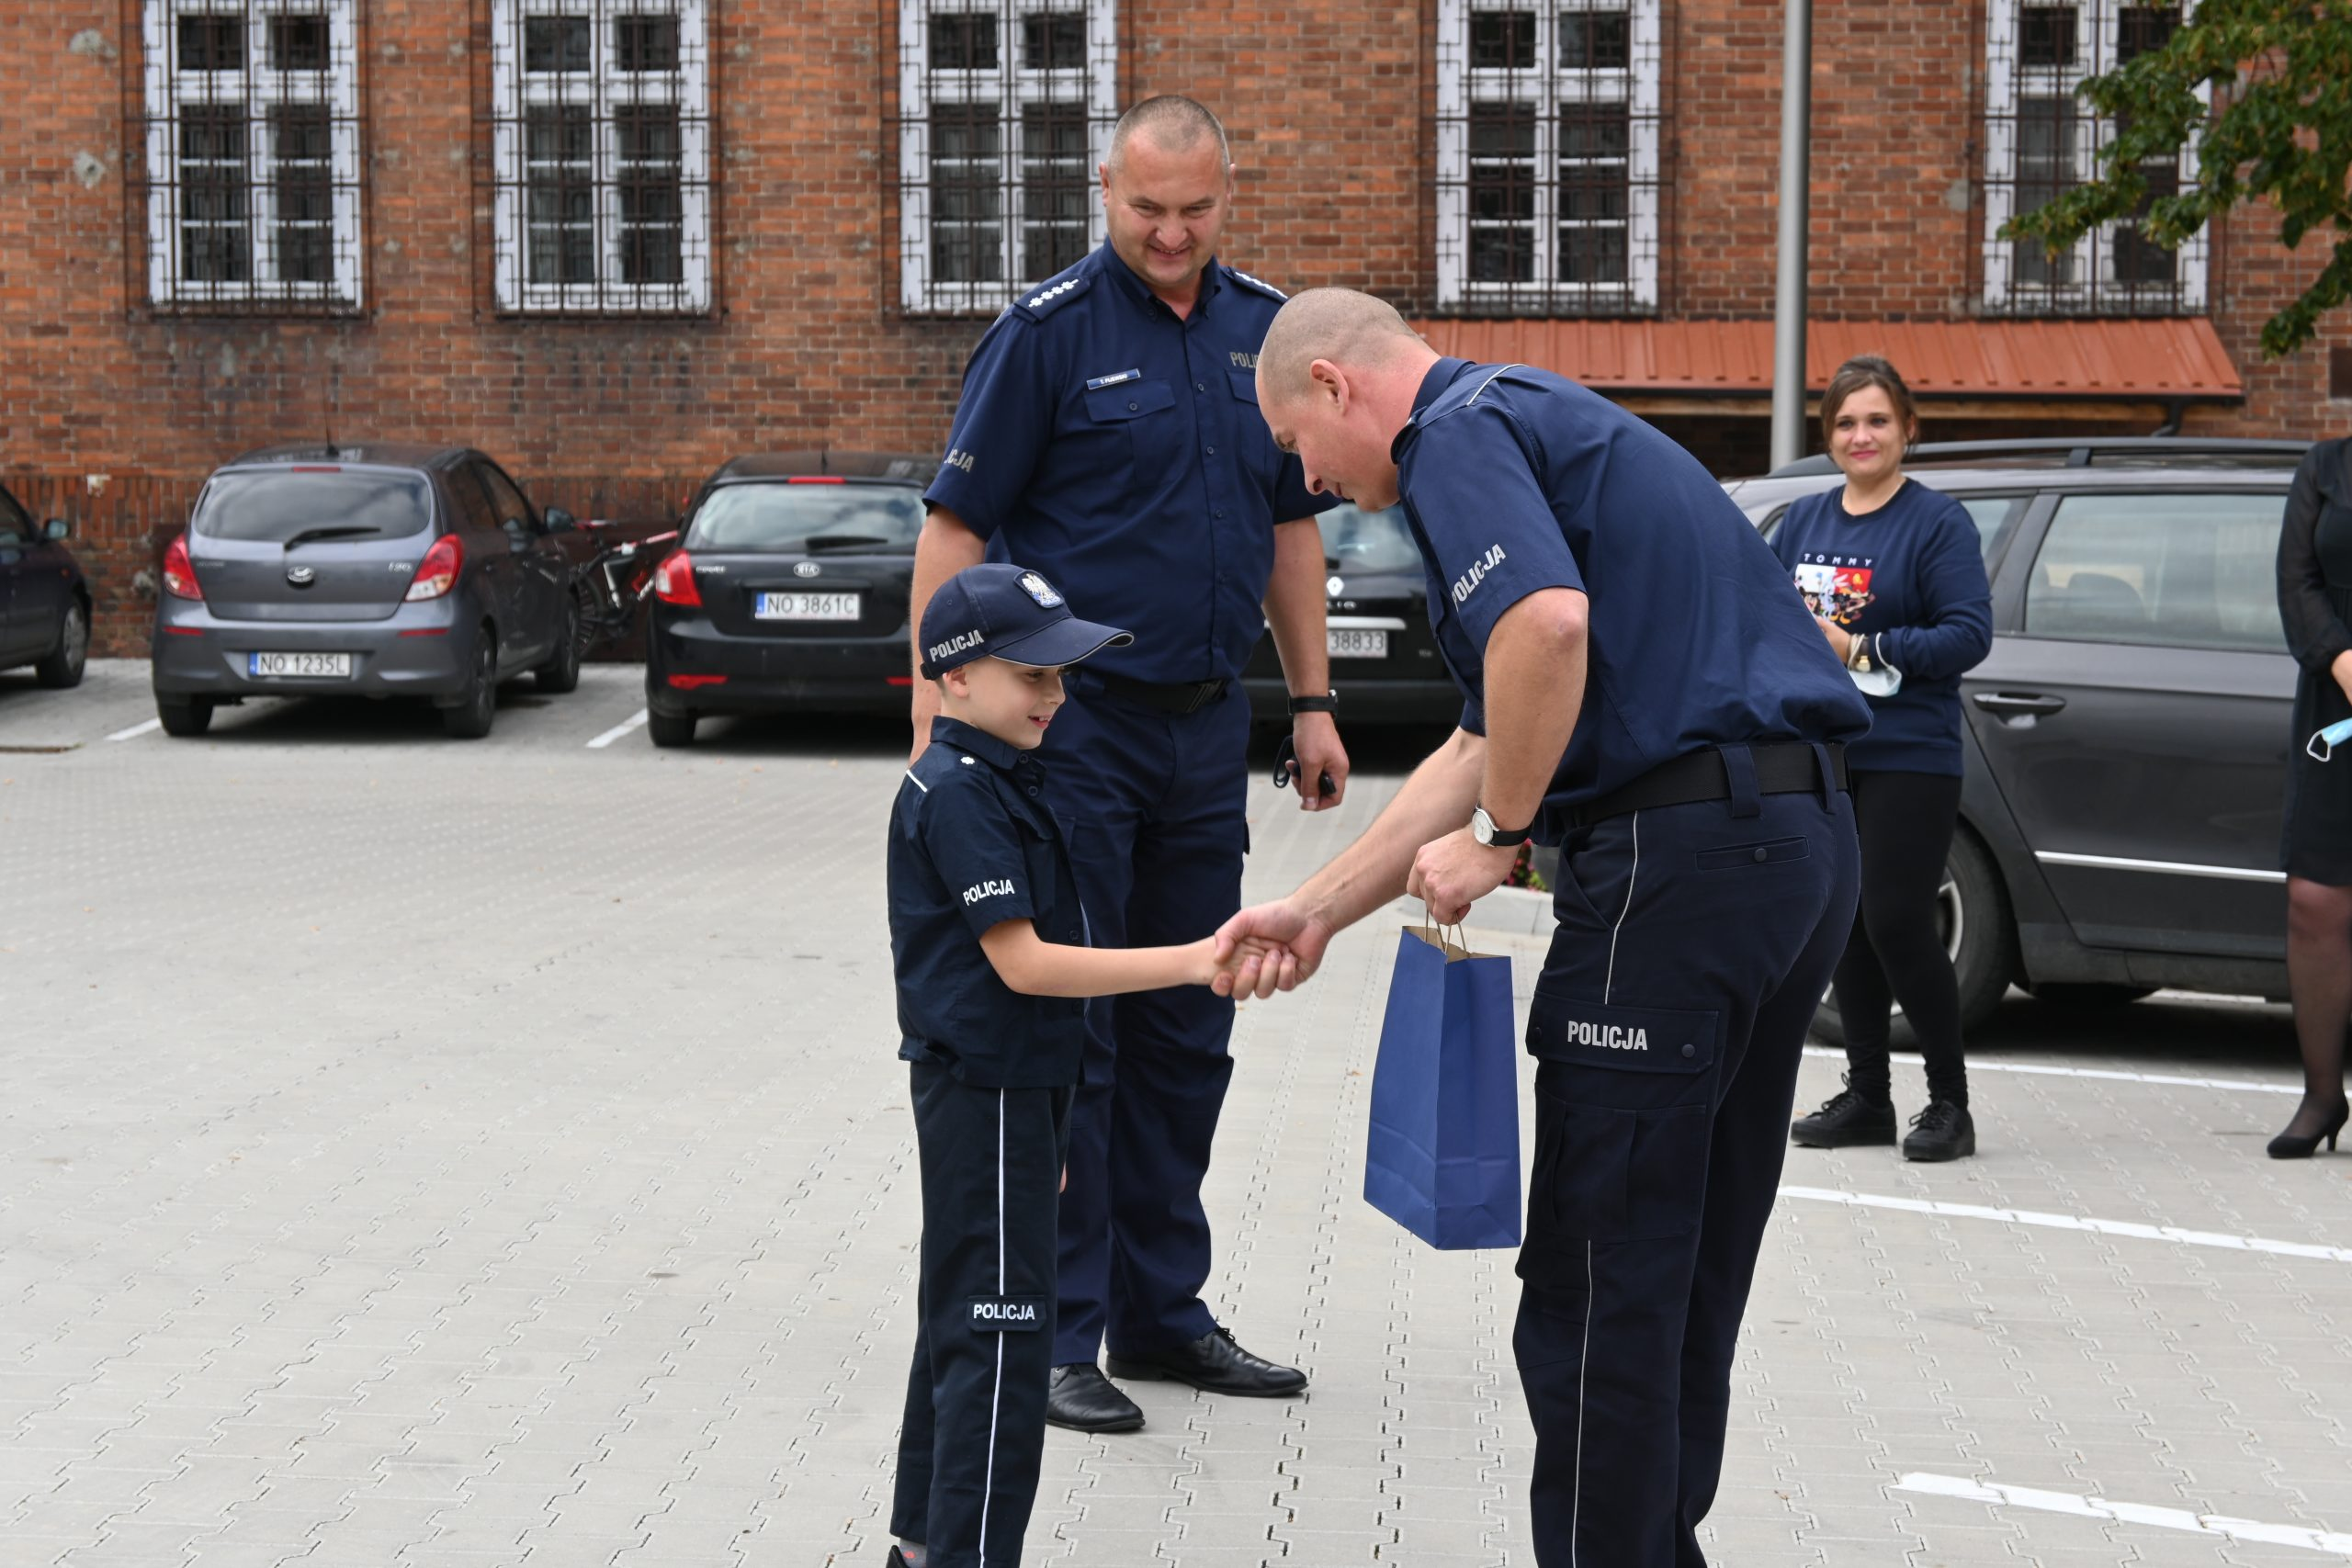 Komendant Komisariatu Policji w Biskupcu dziękuje dla ochotnika za prezentację auta na akumulator